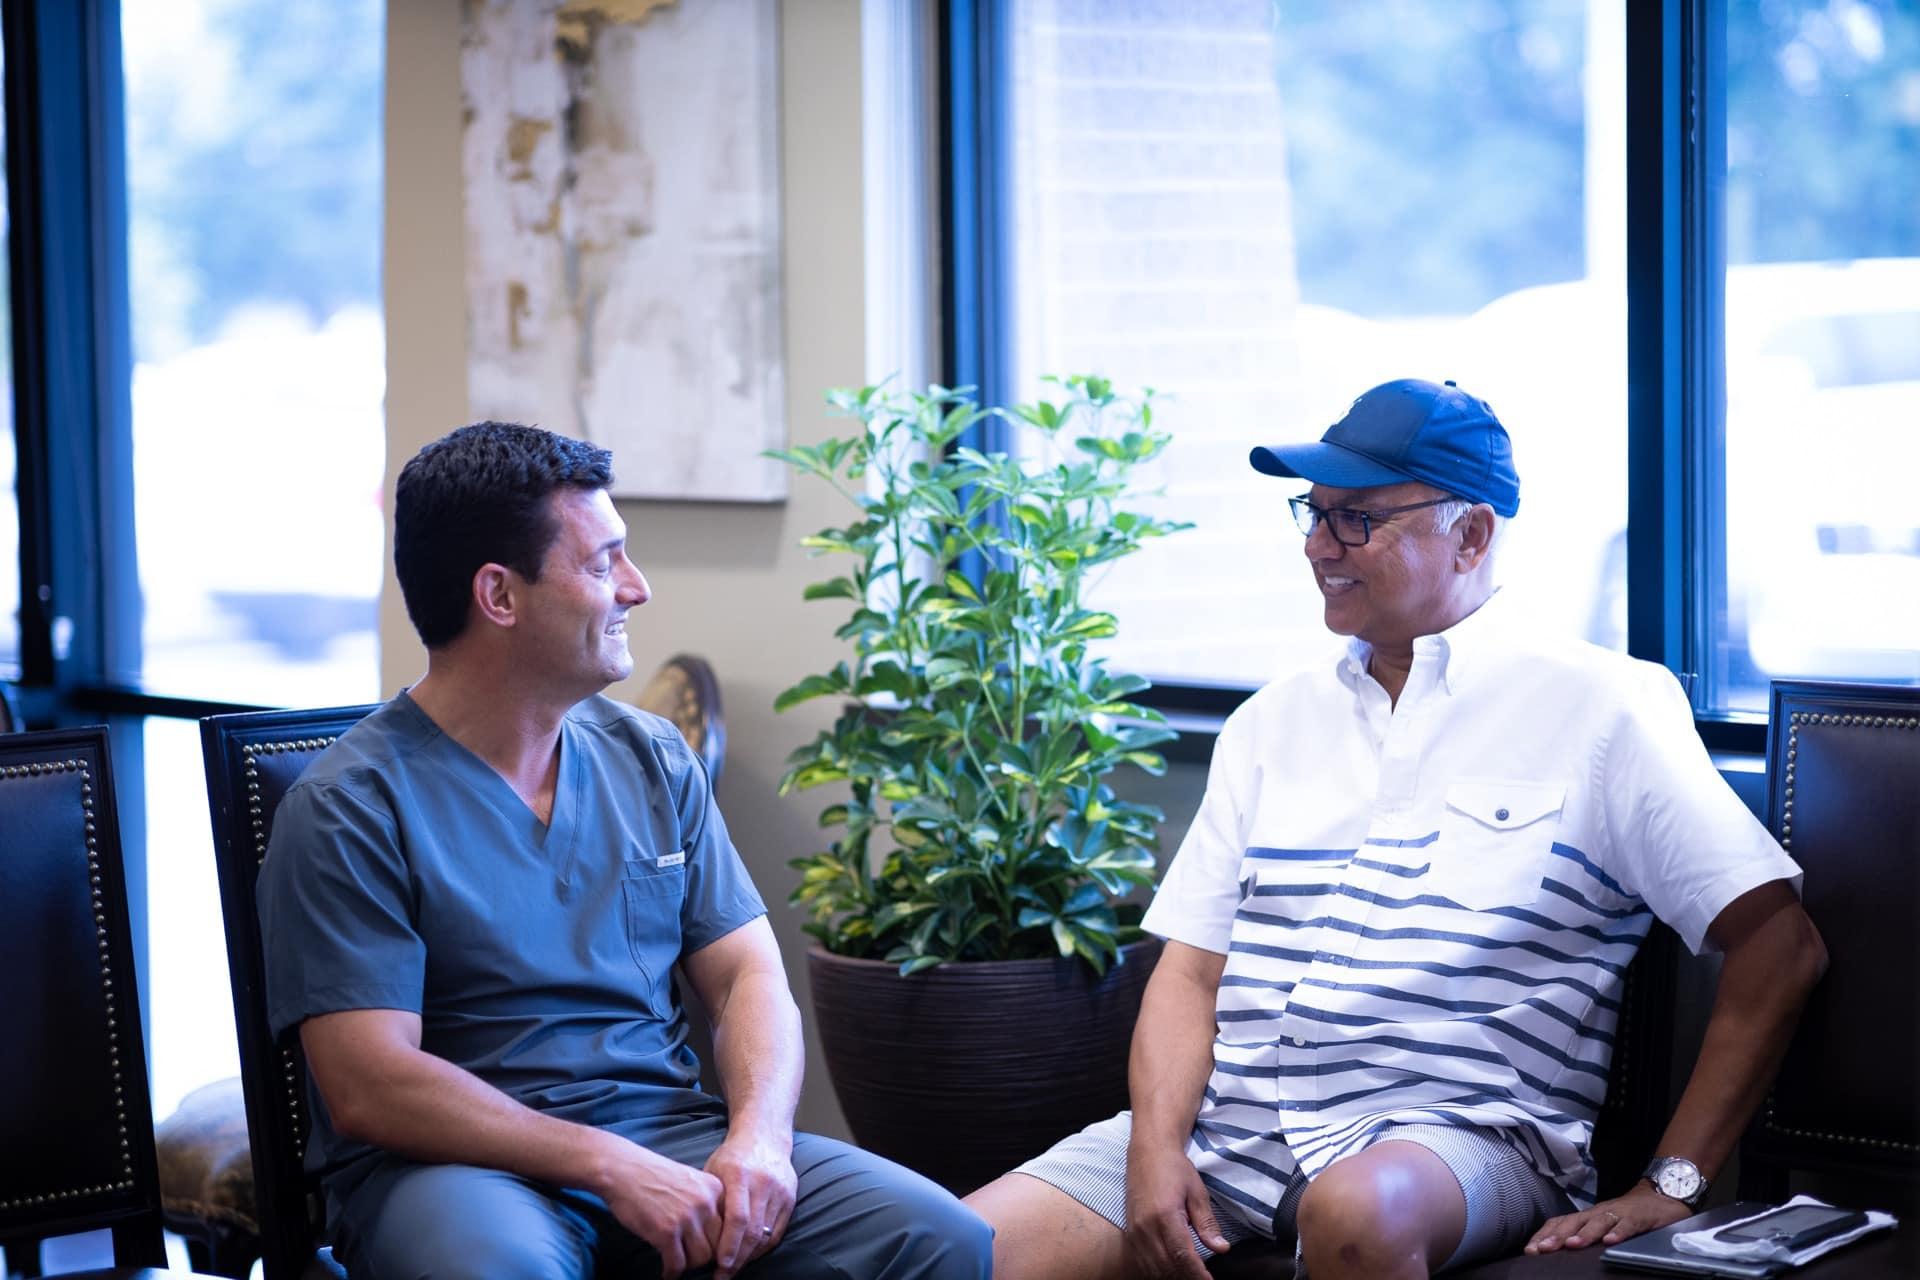 dr. wisener at wisener cooper fergus dds dentist in rogers ar 2019 17 - Bone Grafting